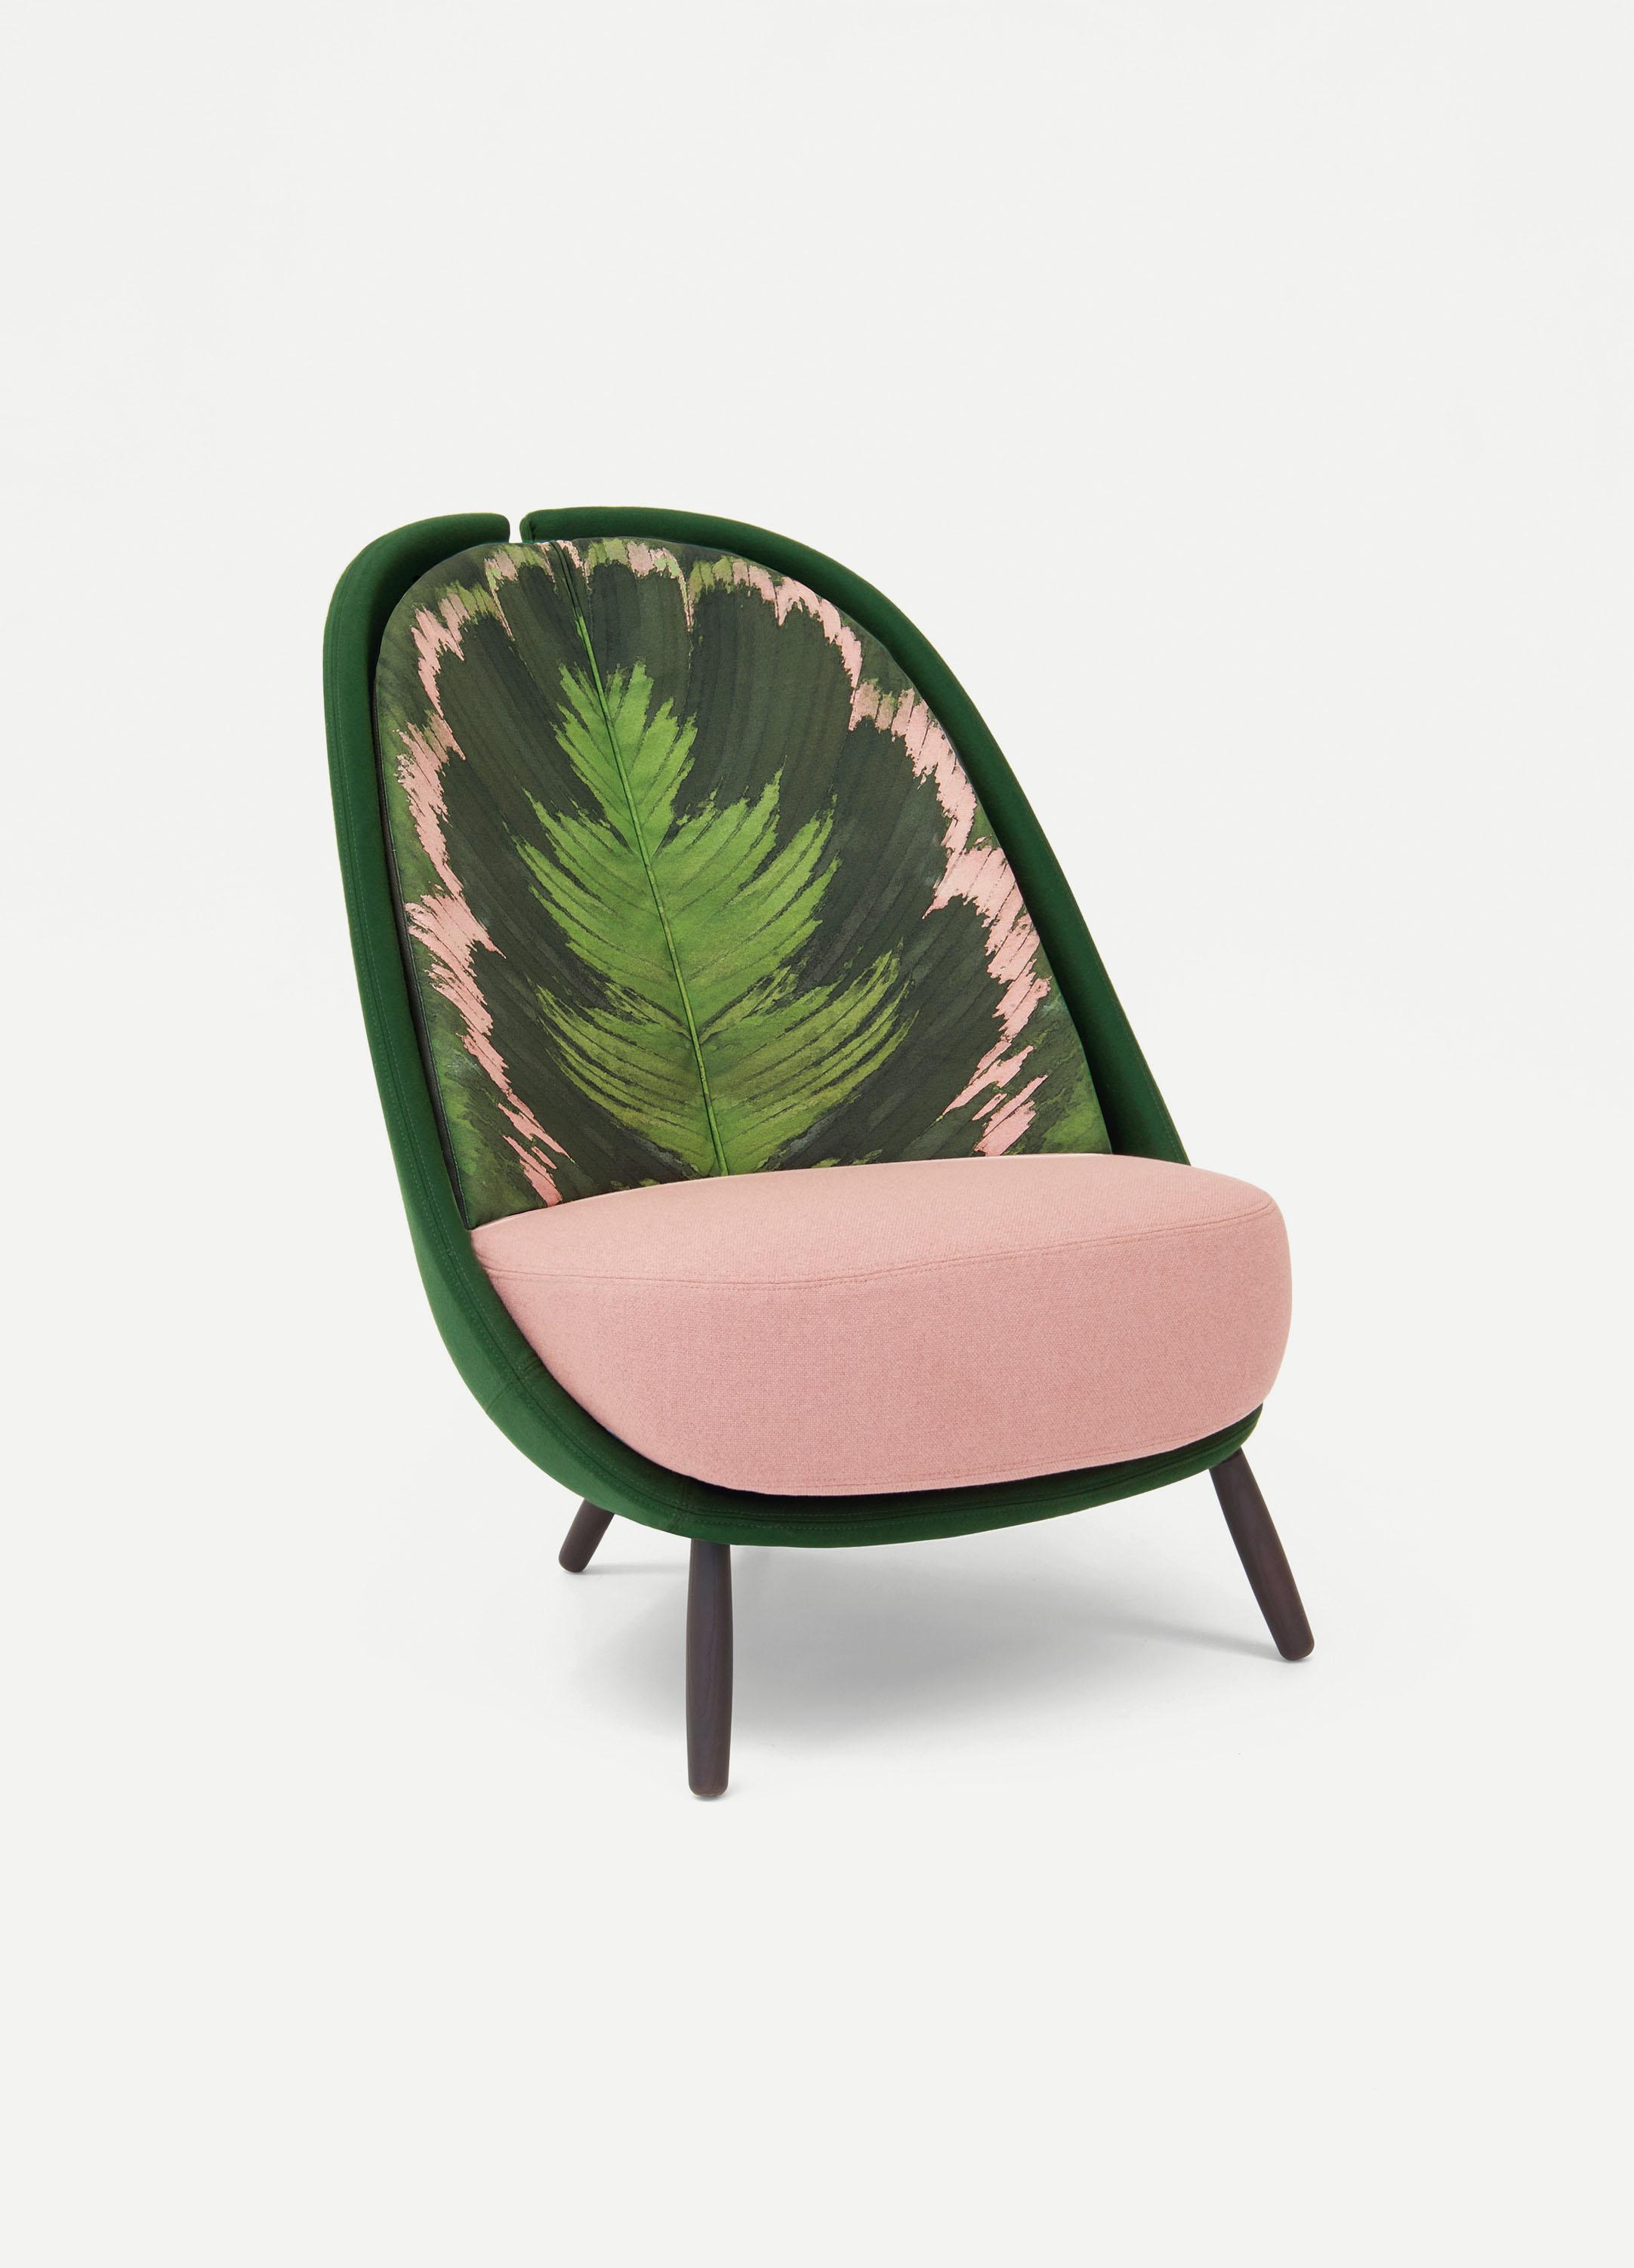 calatea poltrona con stampa foglie, moderna design cristina celestino vince il german design award 2019